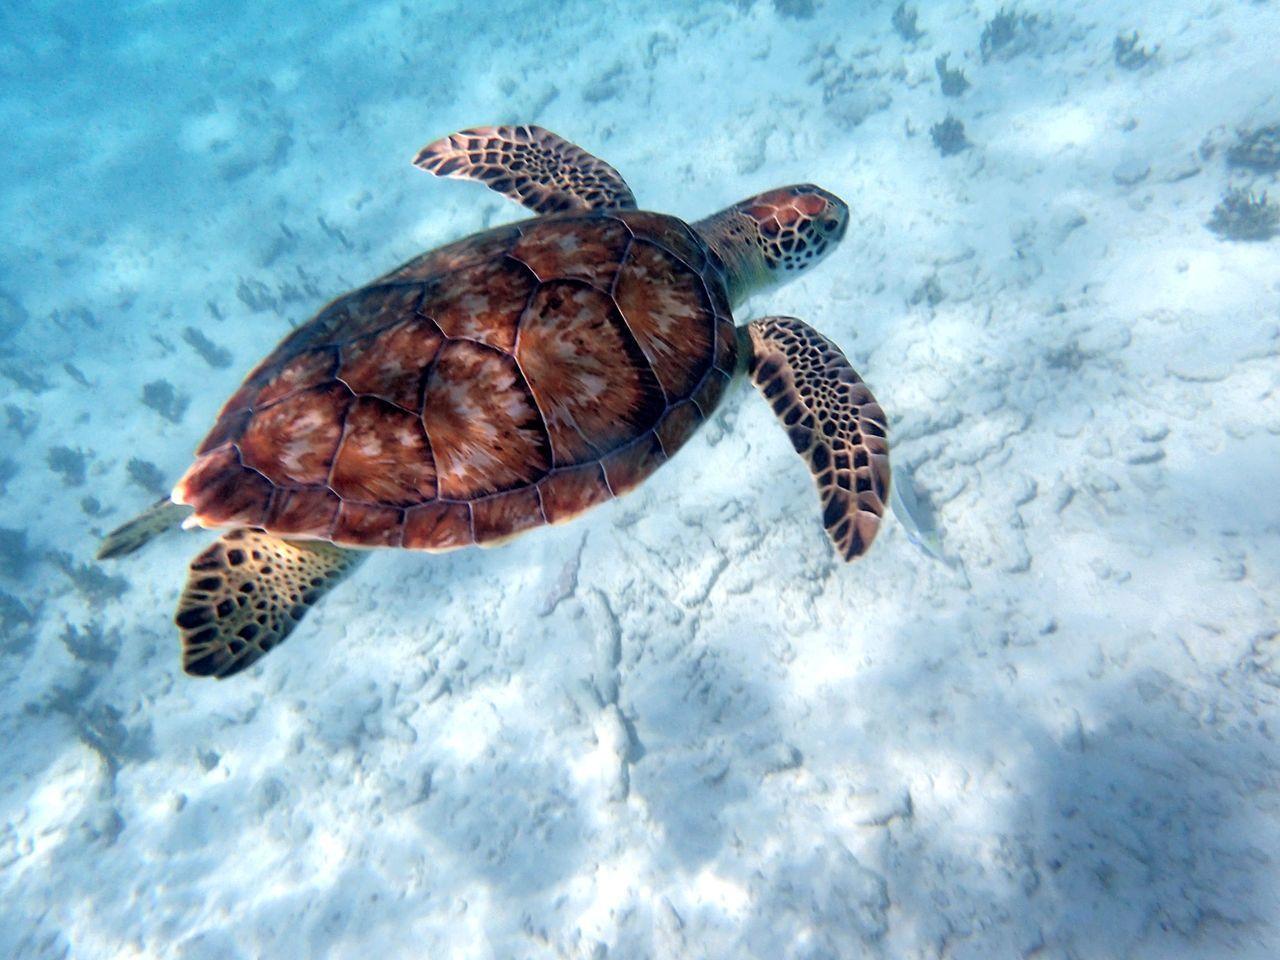 Turtle Sea Turtle Underwater Schorcheln Carretta Carretta Reptile Nature Carribean Sea Little Curacao First Eyeem Photo